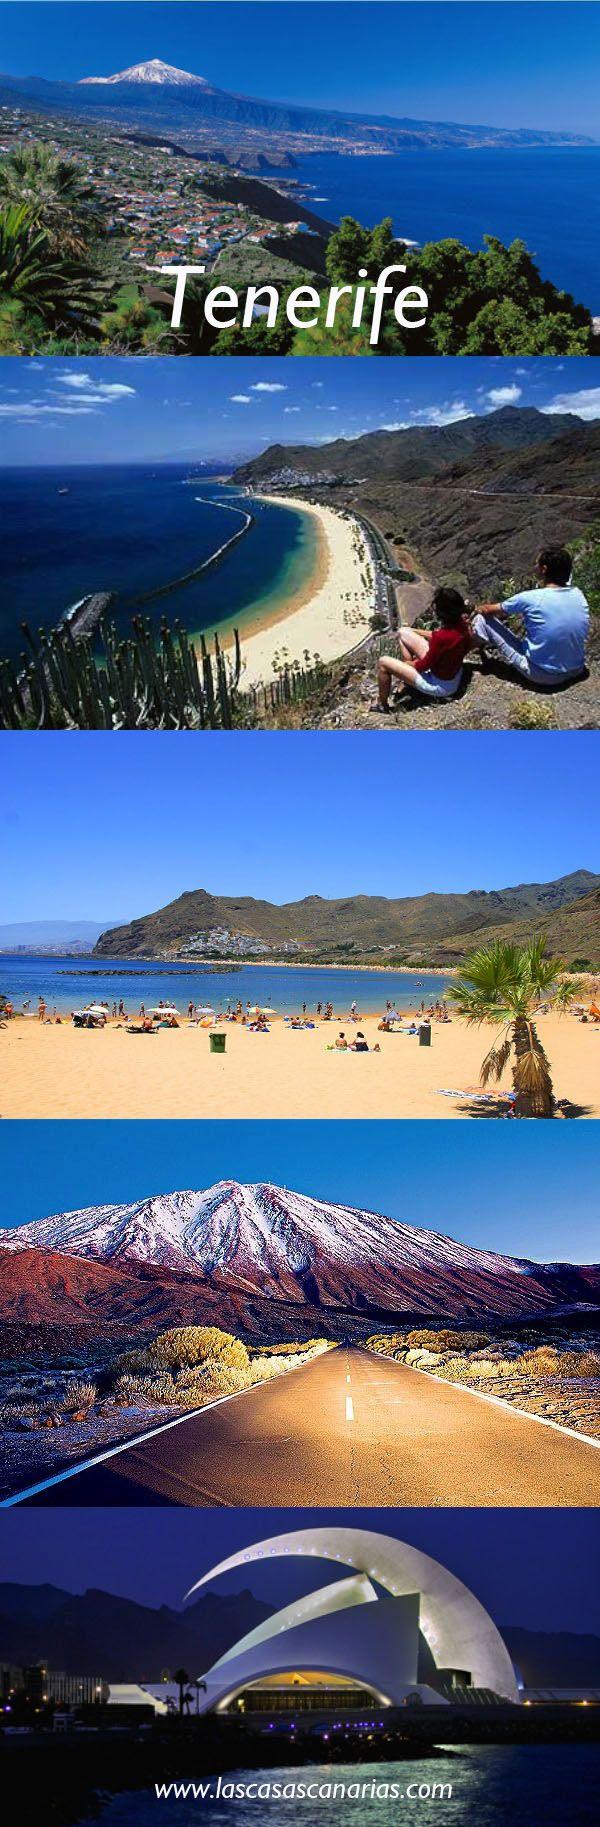 The beautiful island of Tenerife, Canary Islands